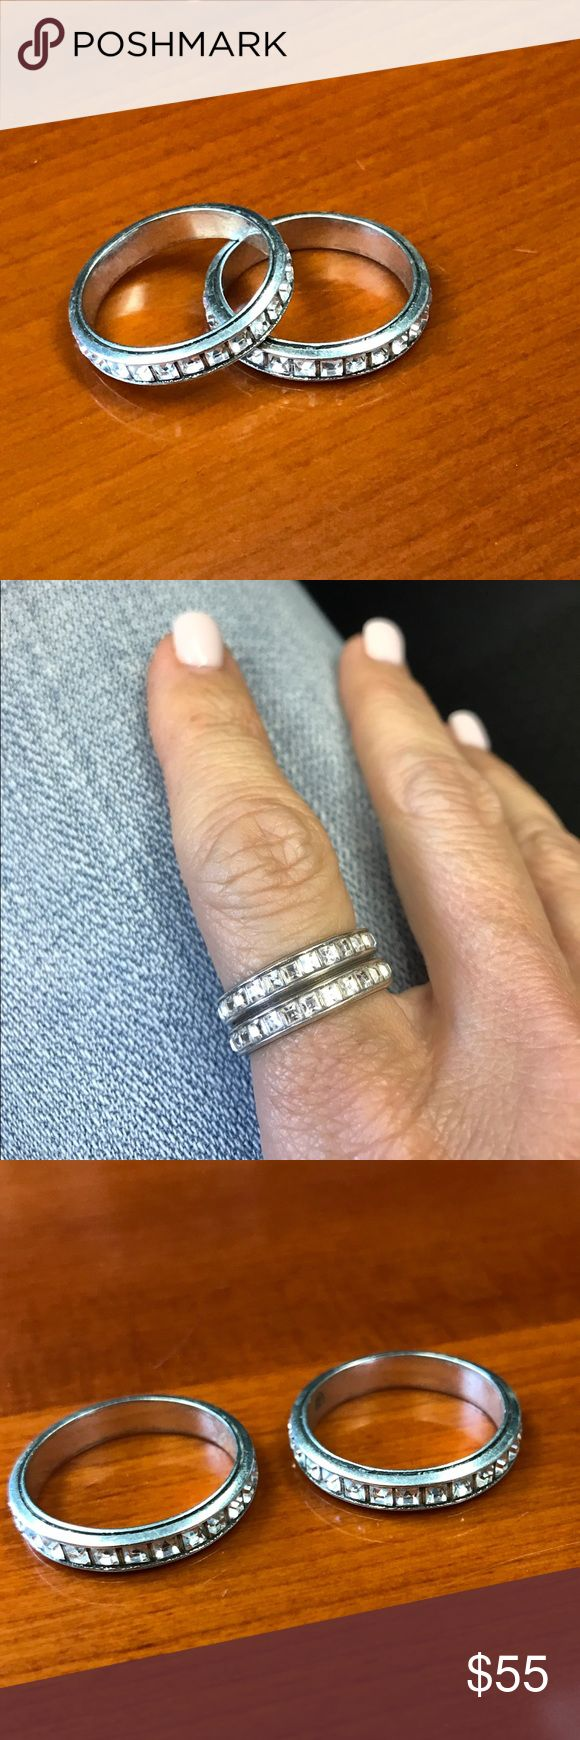 Pandora Rings Set of 2 Pandora rings. Size 7. Pandora Jewelry Rings